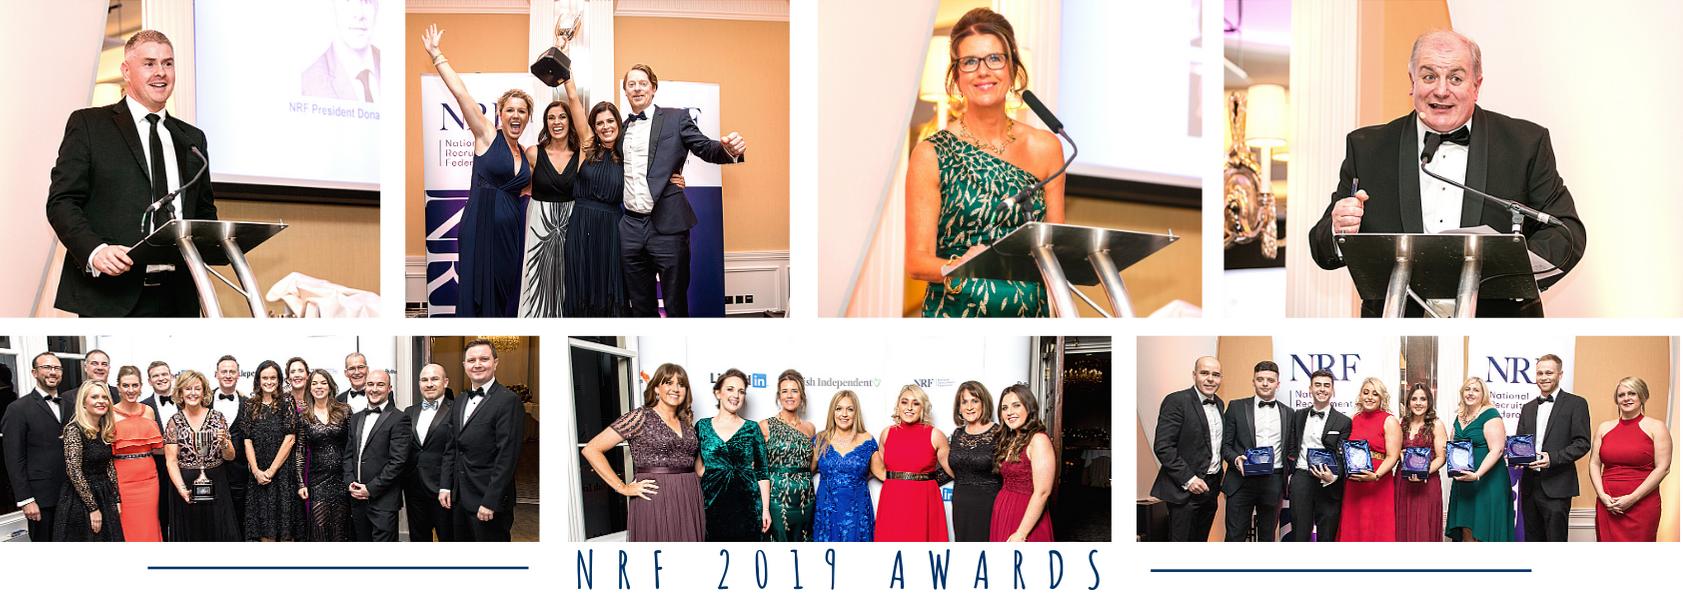 NRF 2019 AWARDS COLLAGE